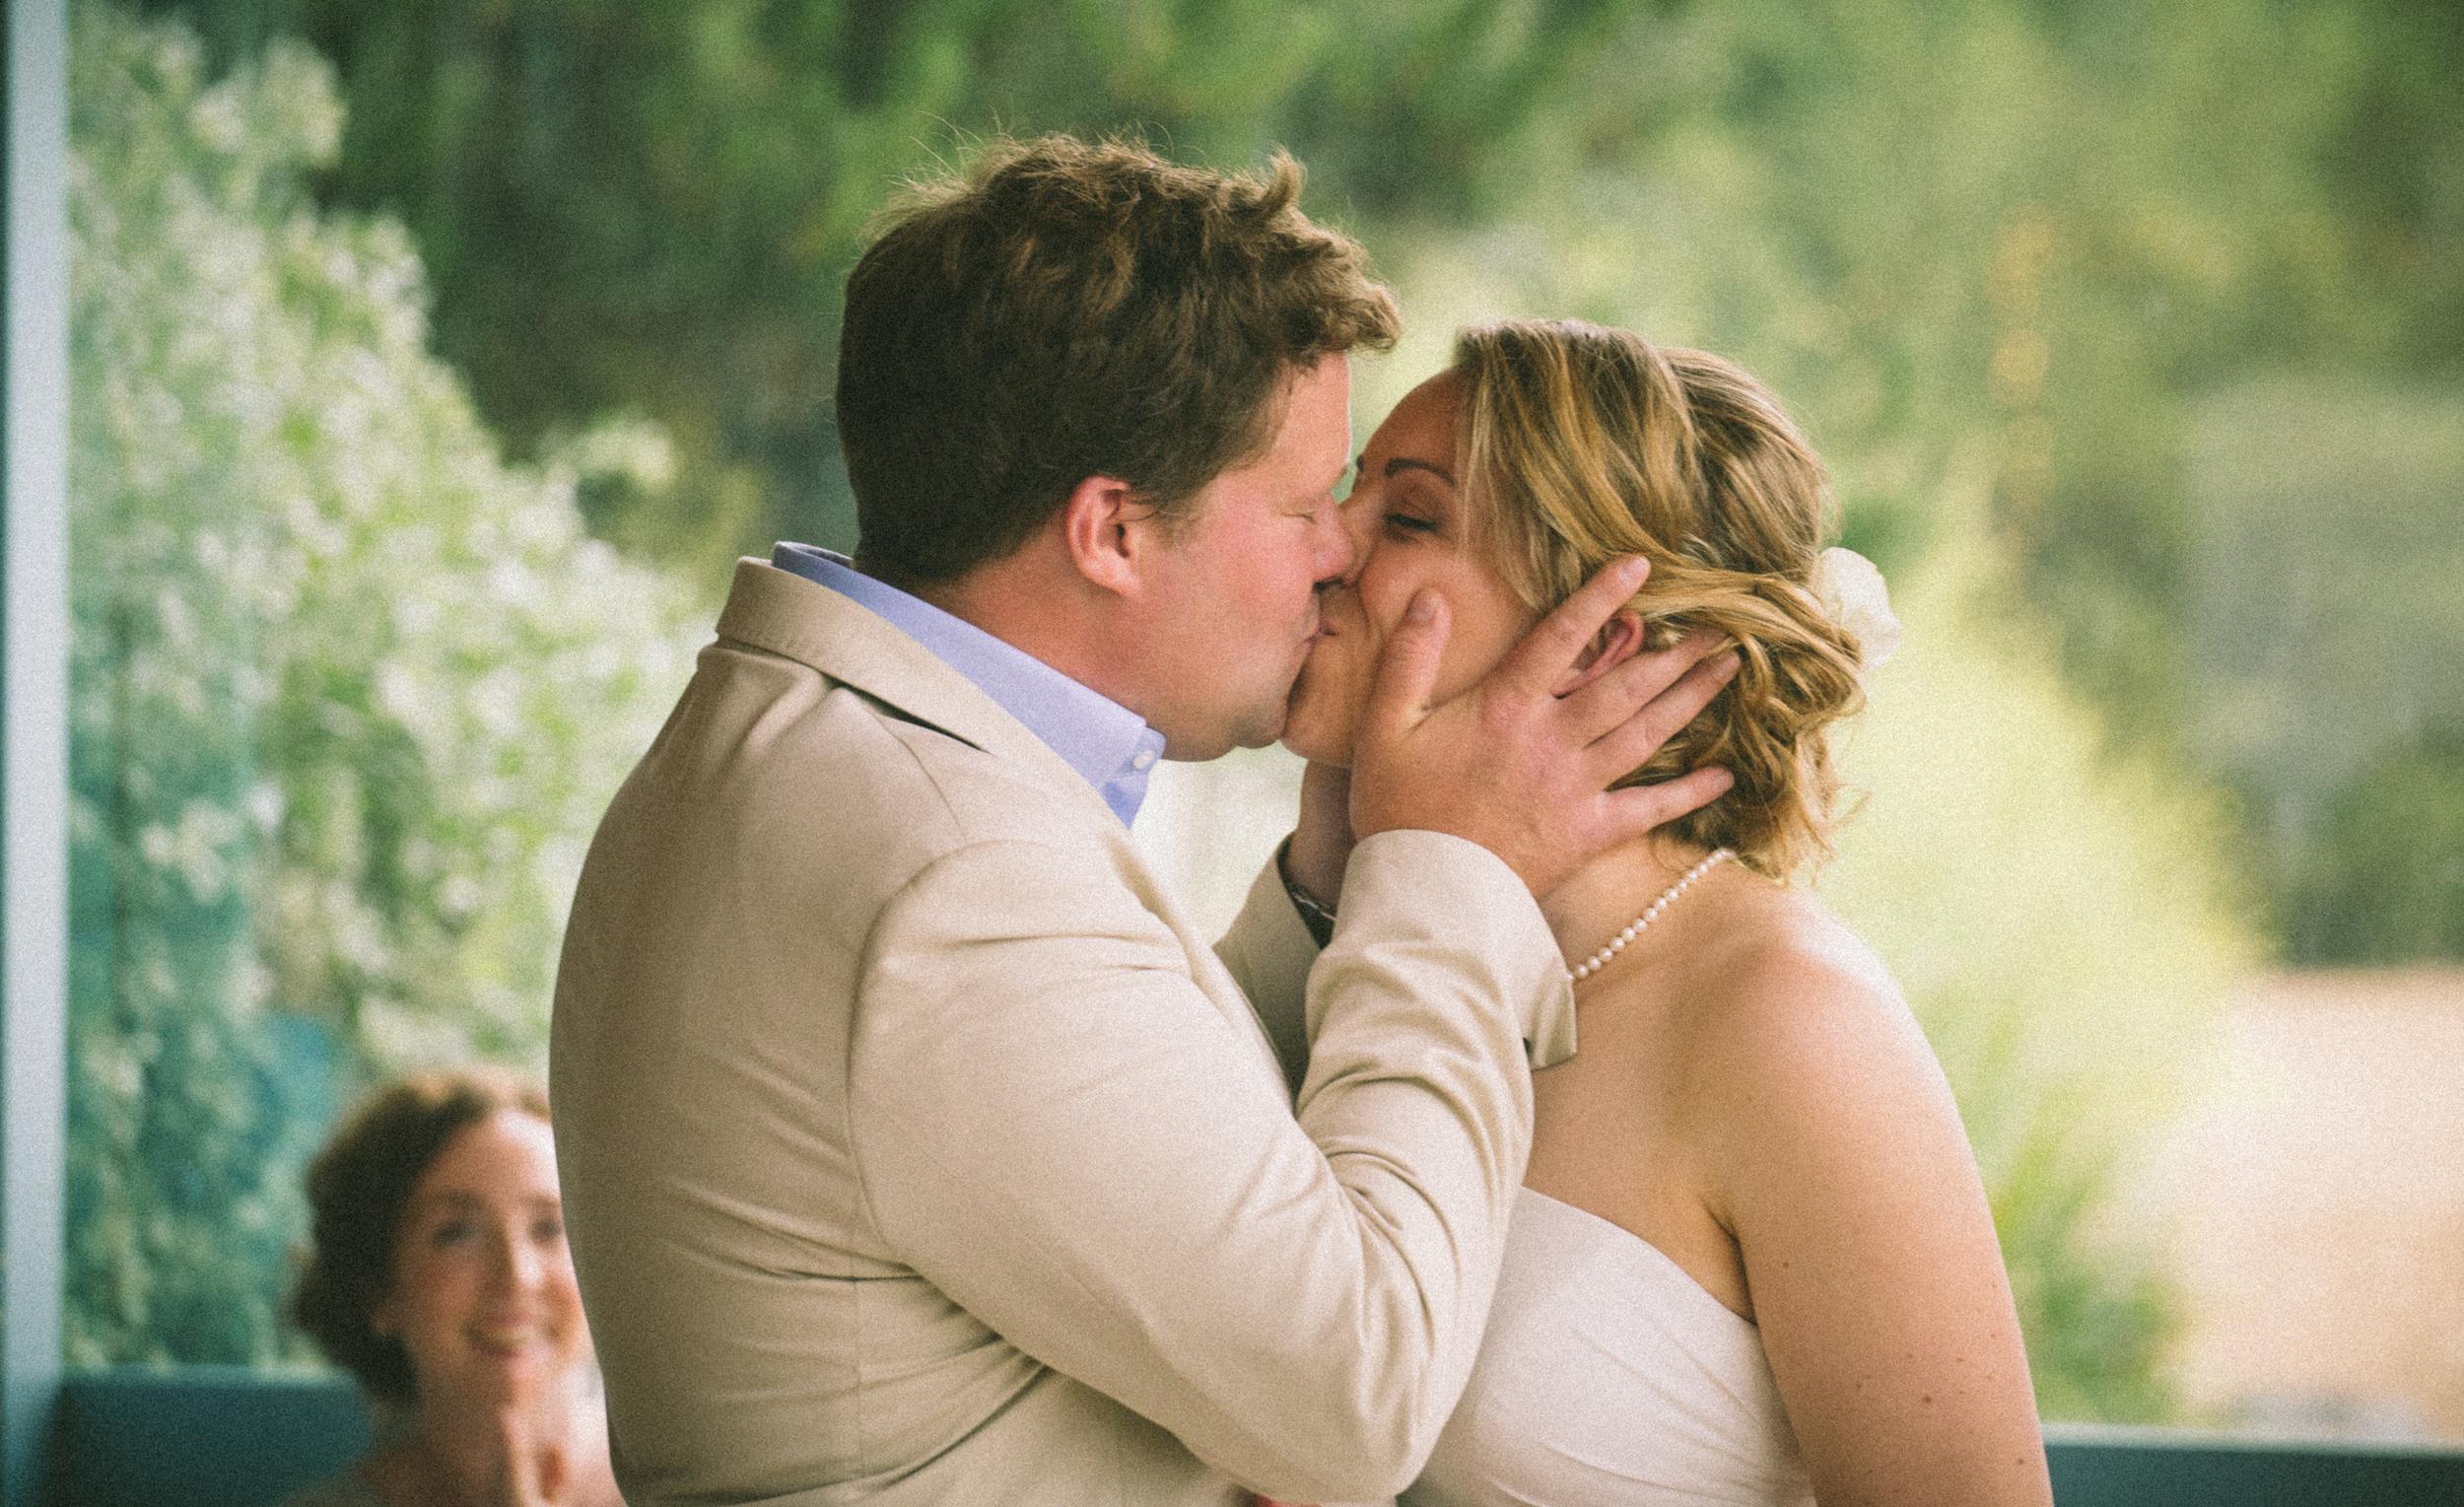 dartmouth-beach-wedding-kiss-2-london-uk-destination-wedding-photography-Adam-Rowley